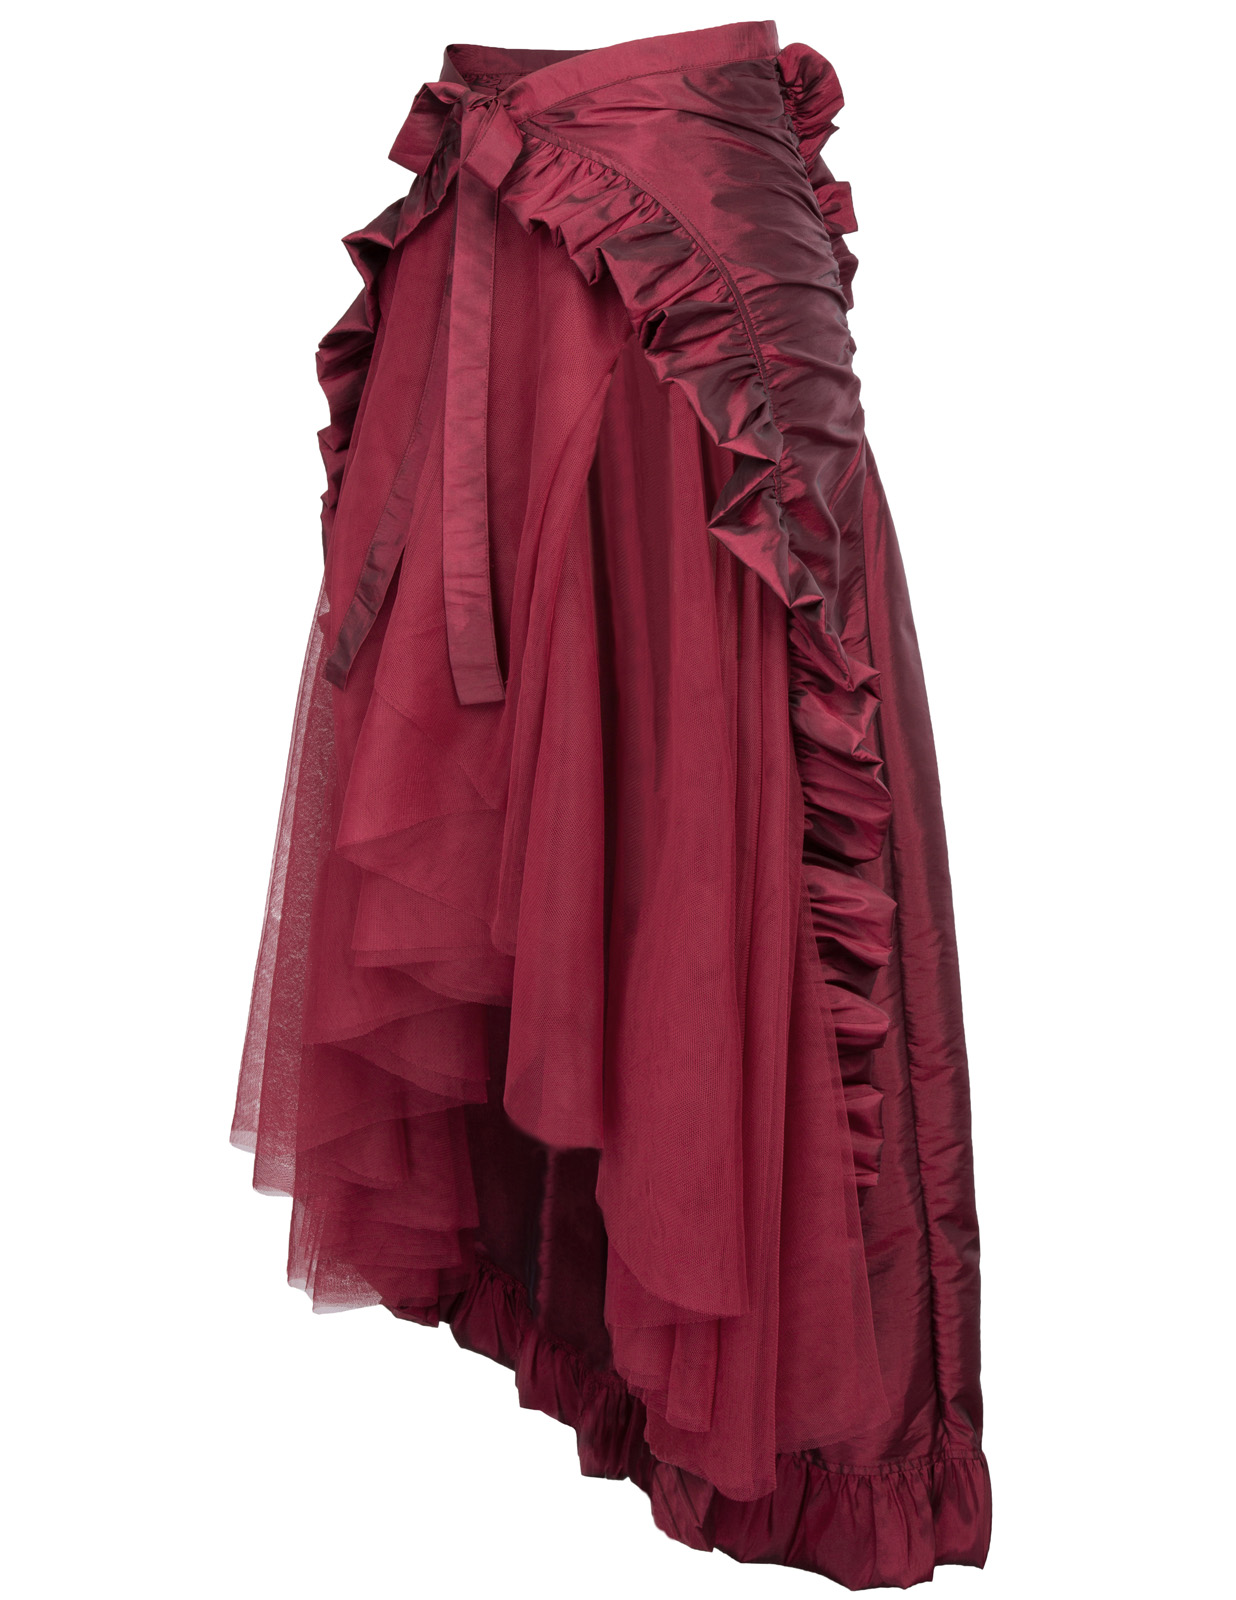 2018 High Quality Fashion elegant New style Steampunk Retro Victorian Lolita Punk Ruffled Long Lace-up Open Skirt